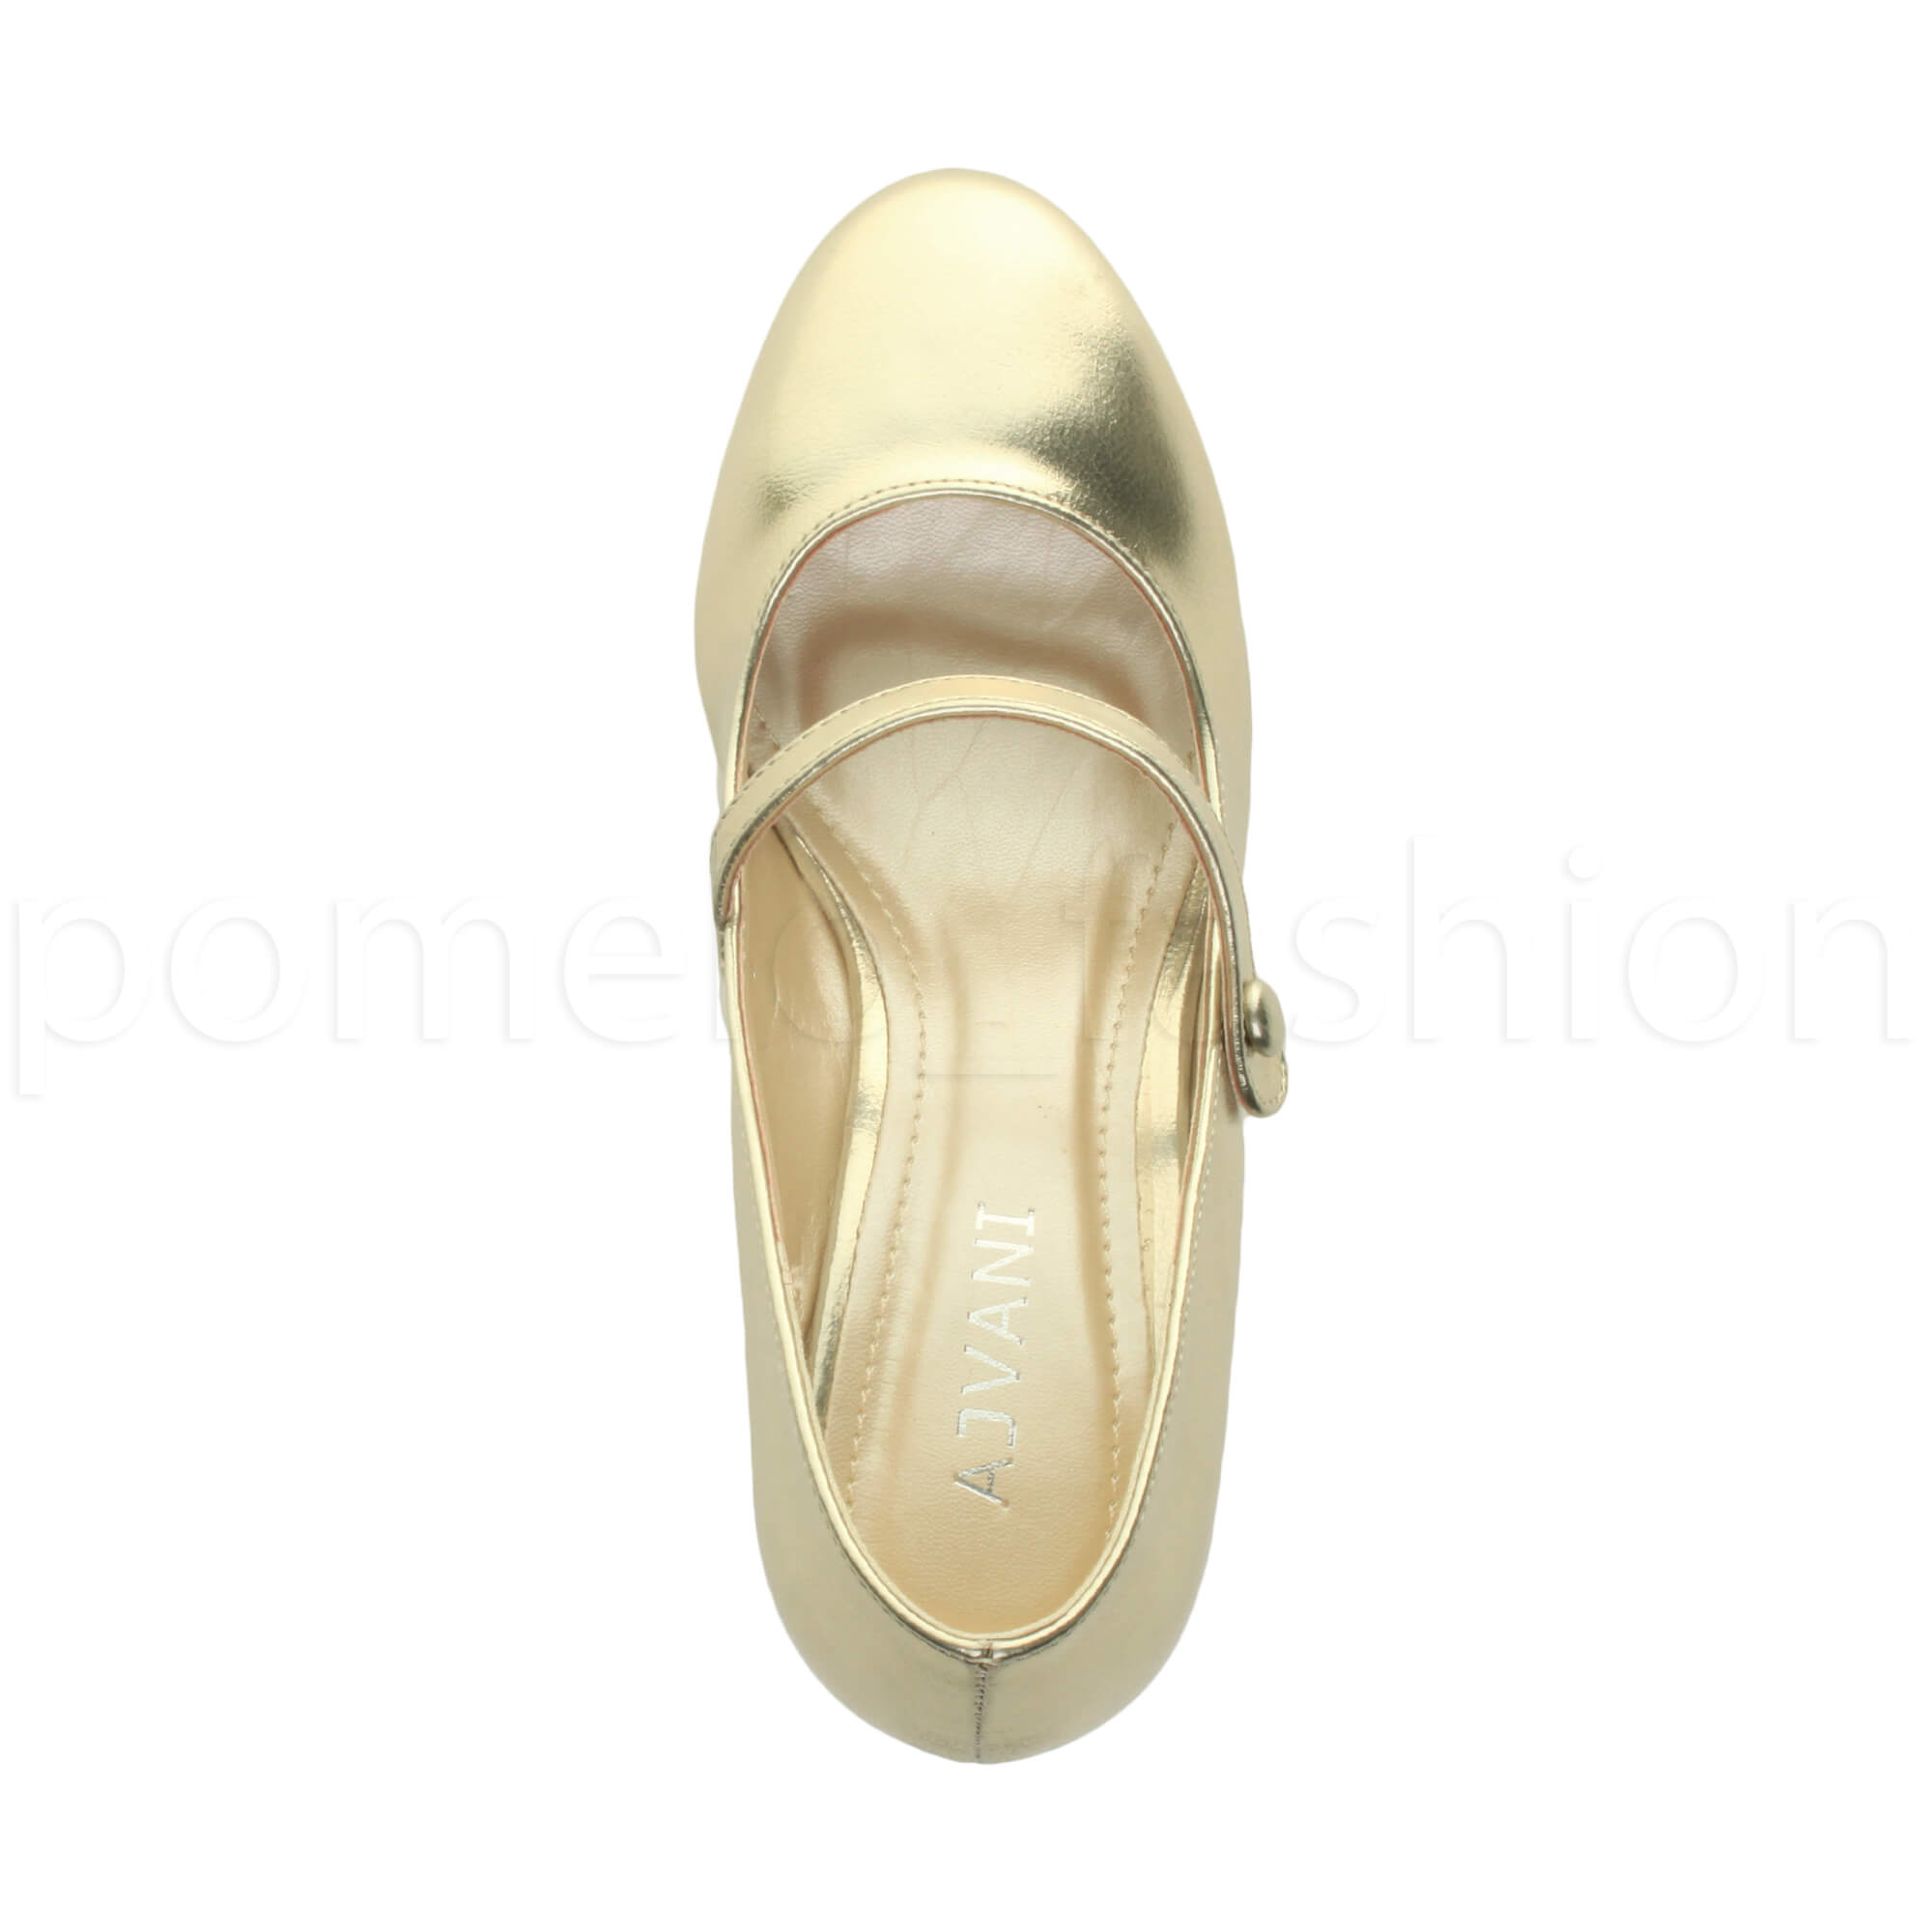 miniatura 70 - Donna basso tacco medio Mary Jane Damigella Matrimonio Pompe Scarpe Da Sera Taglia